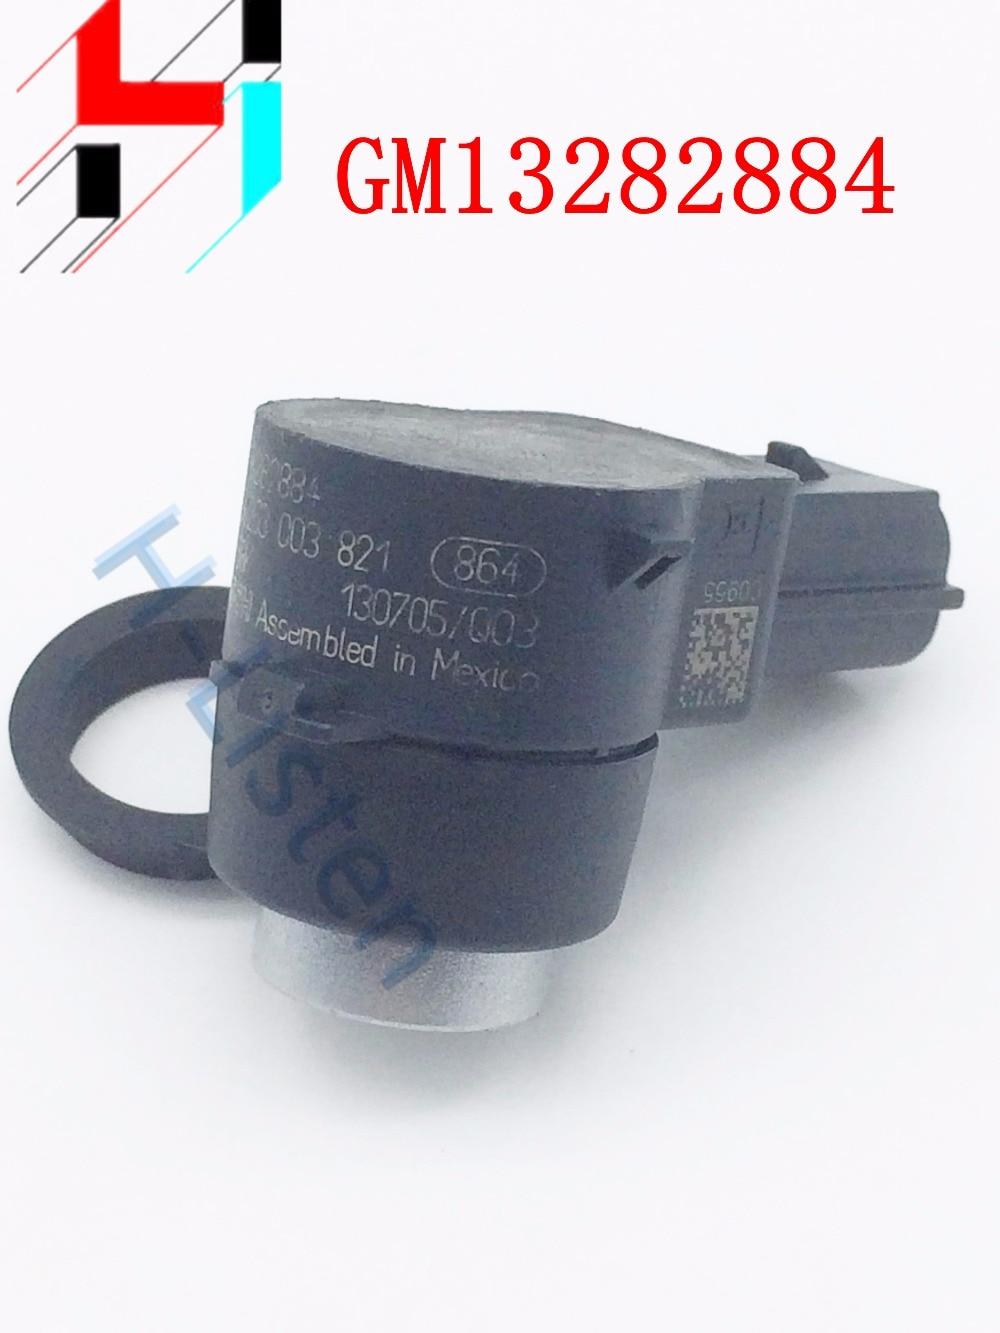 PDC Einparkhilfe Sensor Unterstützung parkplatz sensor Für 2008-2015 Opel Cruz 13282884 0263003821 25855503 silber farbe